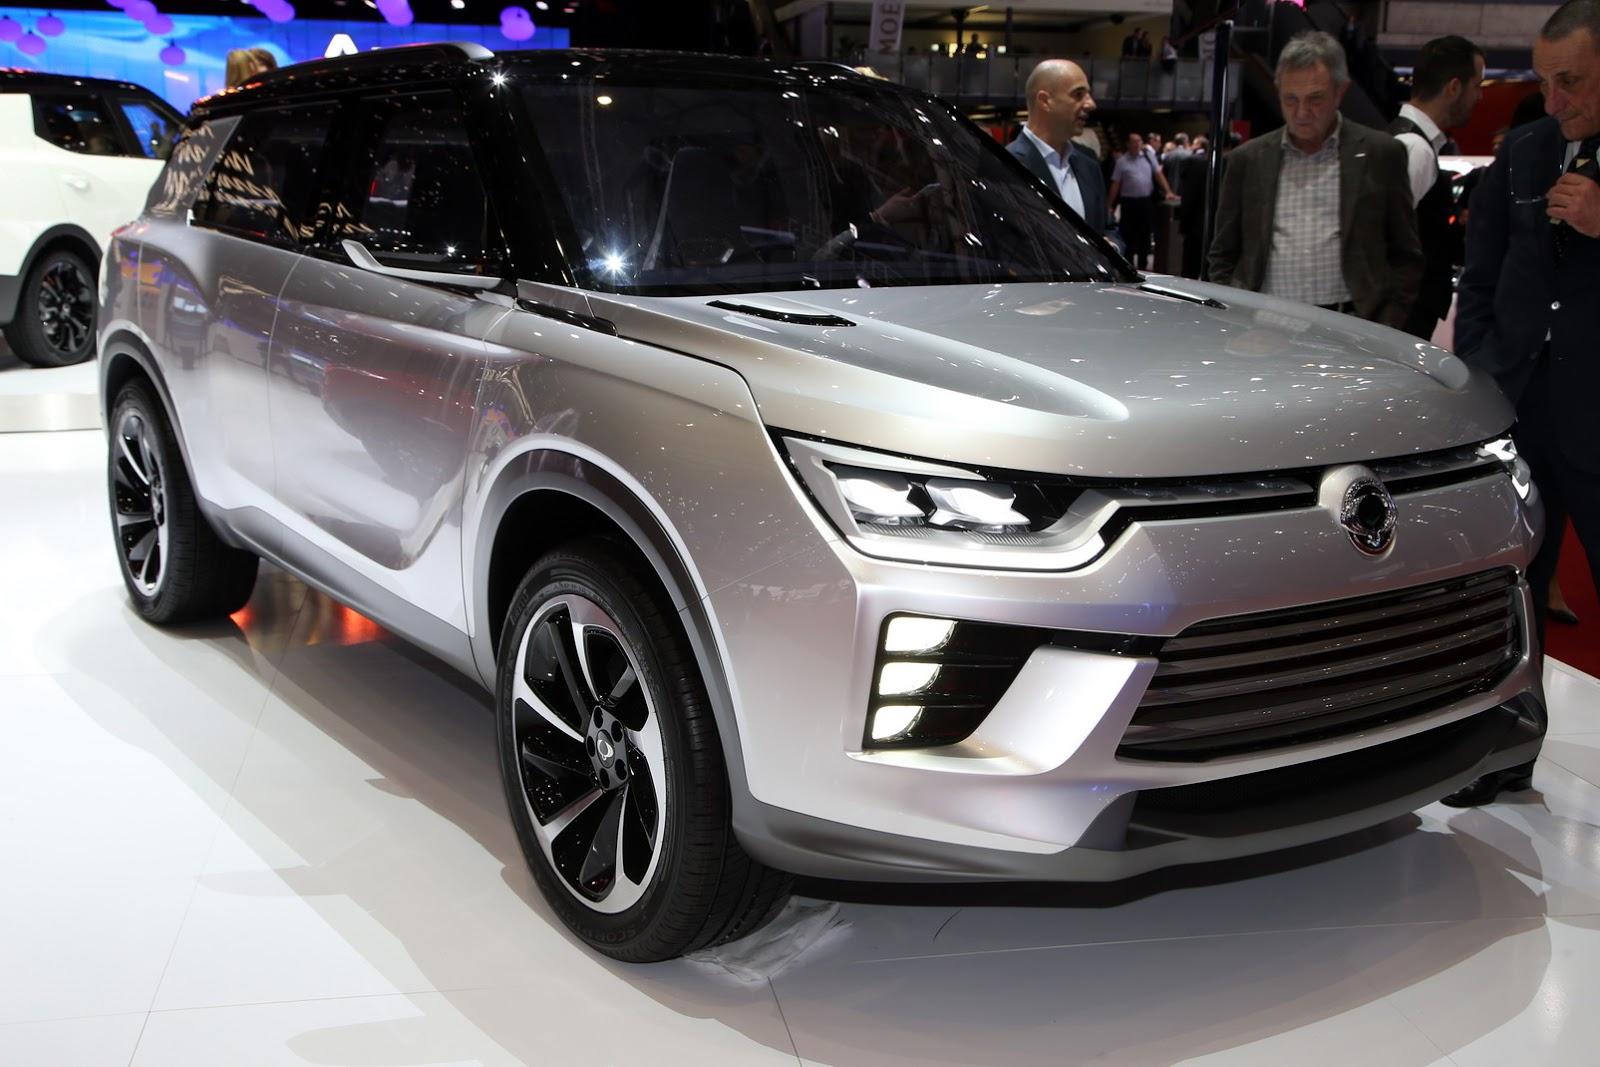 SsangYong SIV-2 Concept 2016 mang nhiều nét giống Ranger Rover